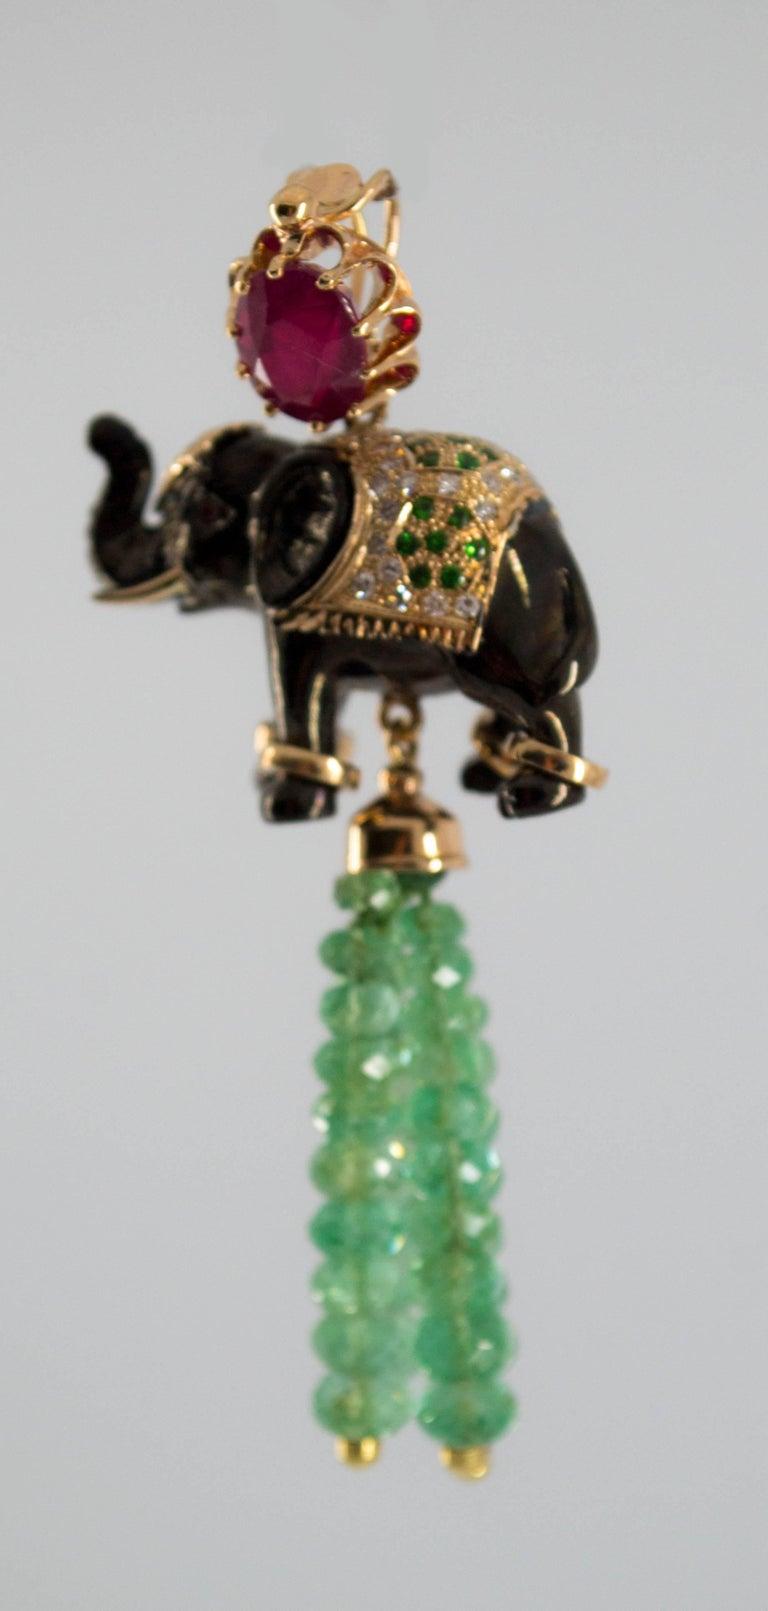 19.90 Carat Emerald 3.10 Carat Ruby Tsavorite Yellow Gold Elephant Pendant For Sale 3